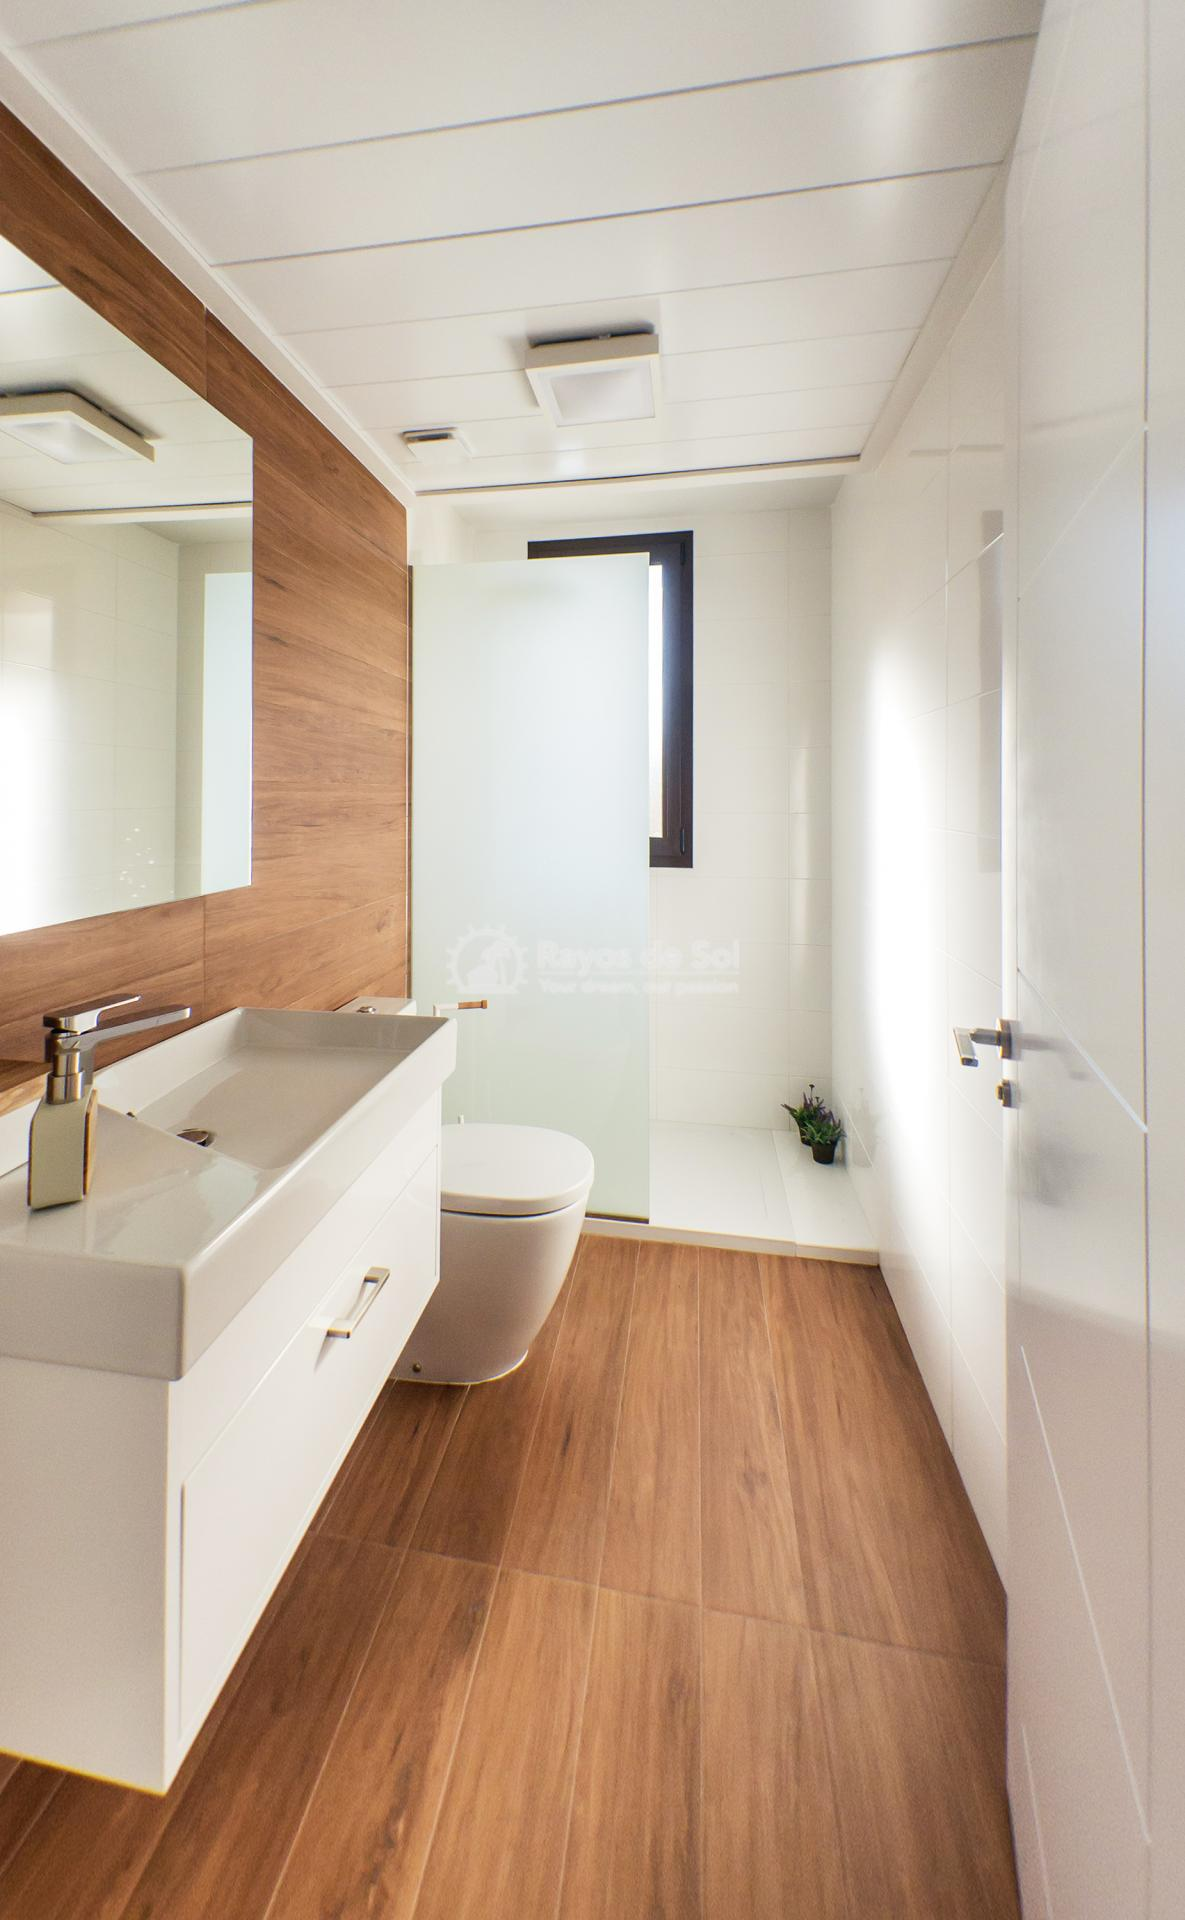 Golf apartment ground floor in Las Ramblas, Villamartin, Costa Blanca (VIPALO3-2B) - 16